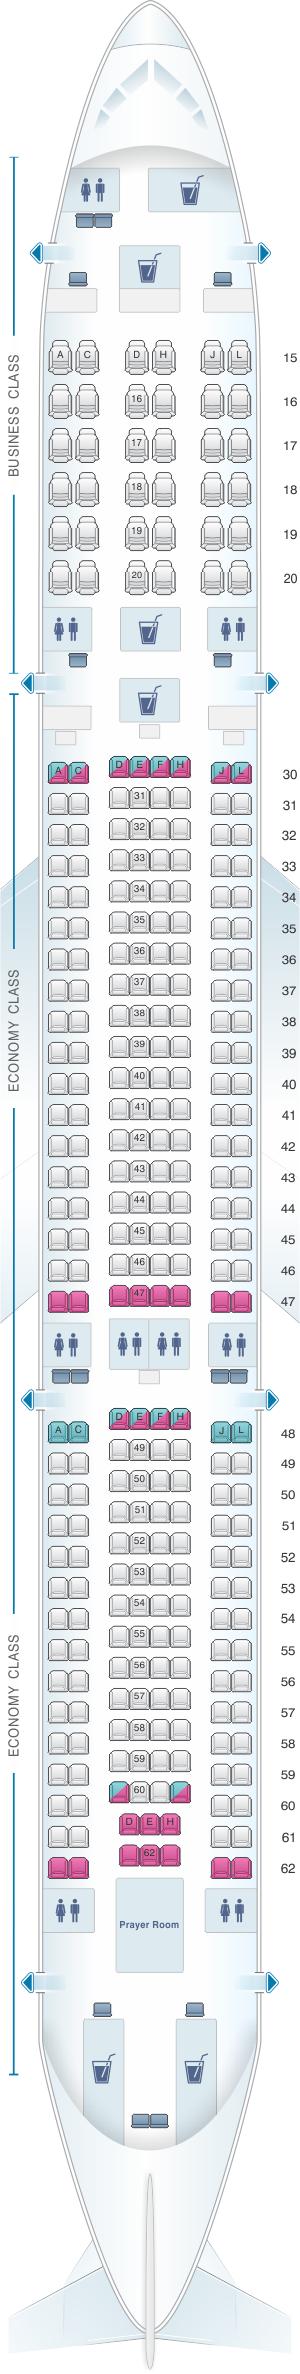 Seat map for Saudi Arabian Airlines Airbus A330 300 (333)